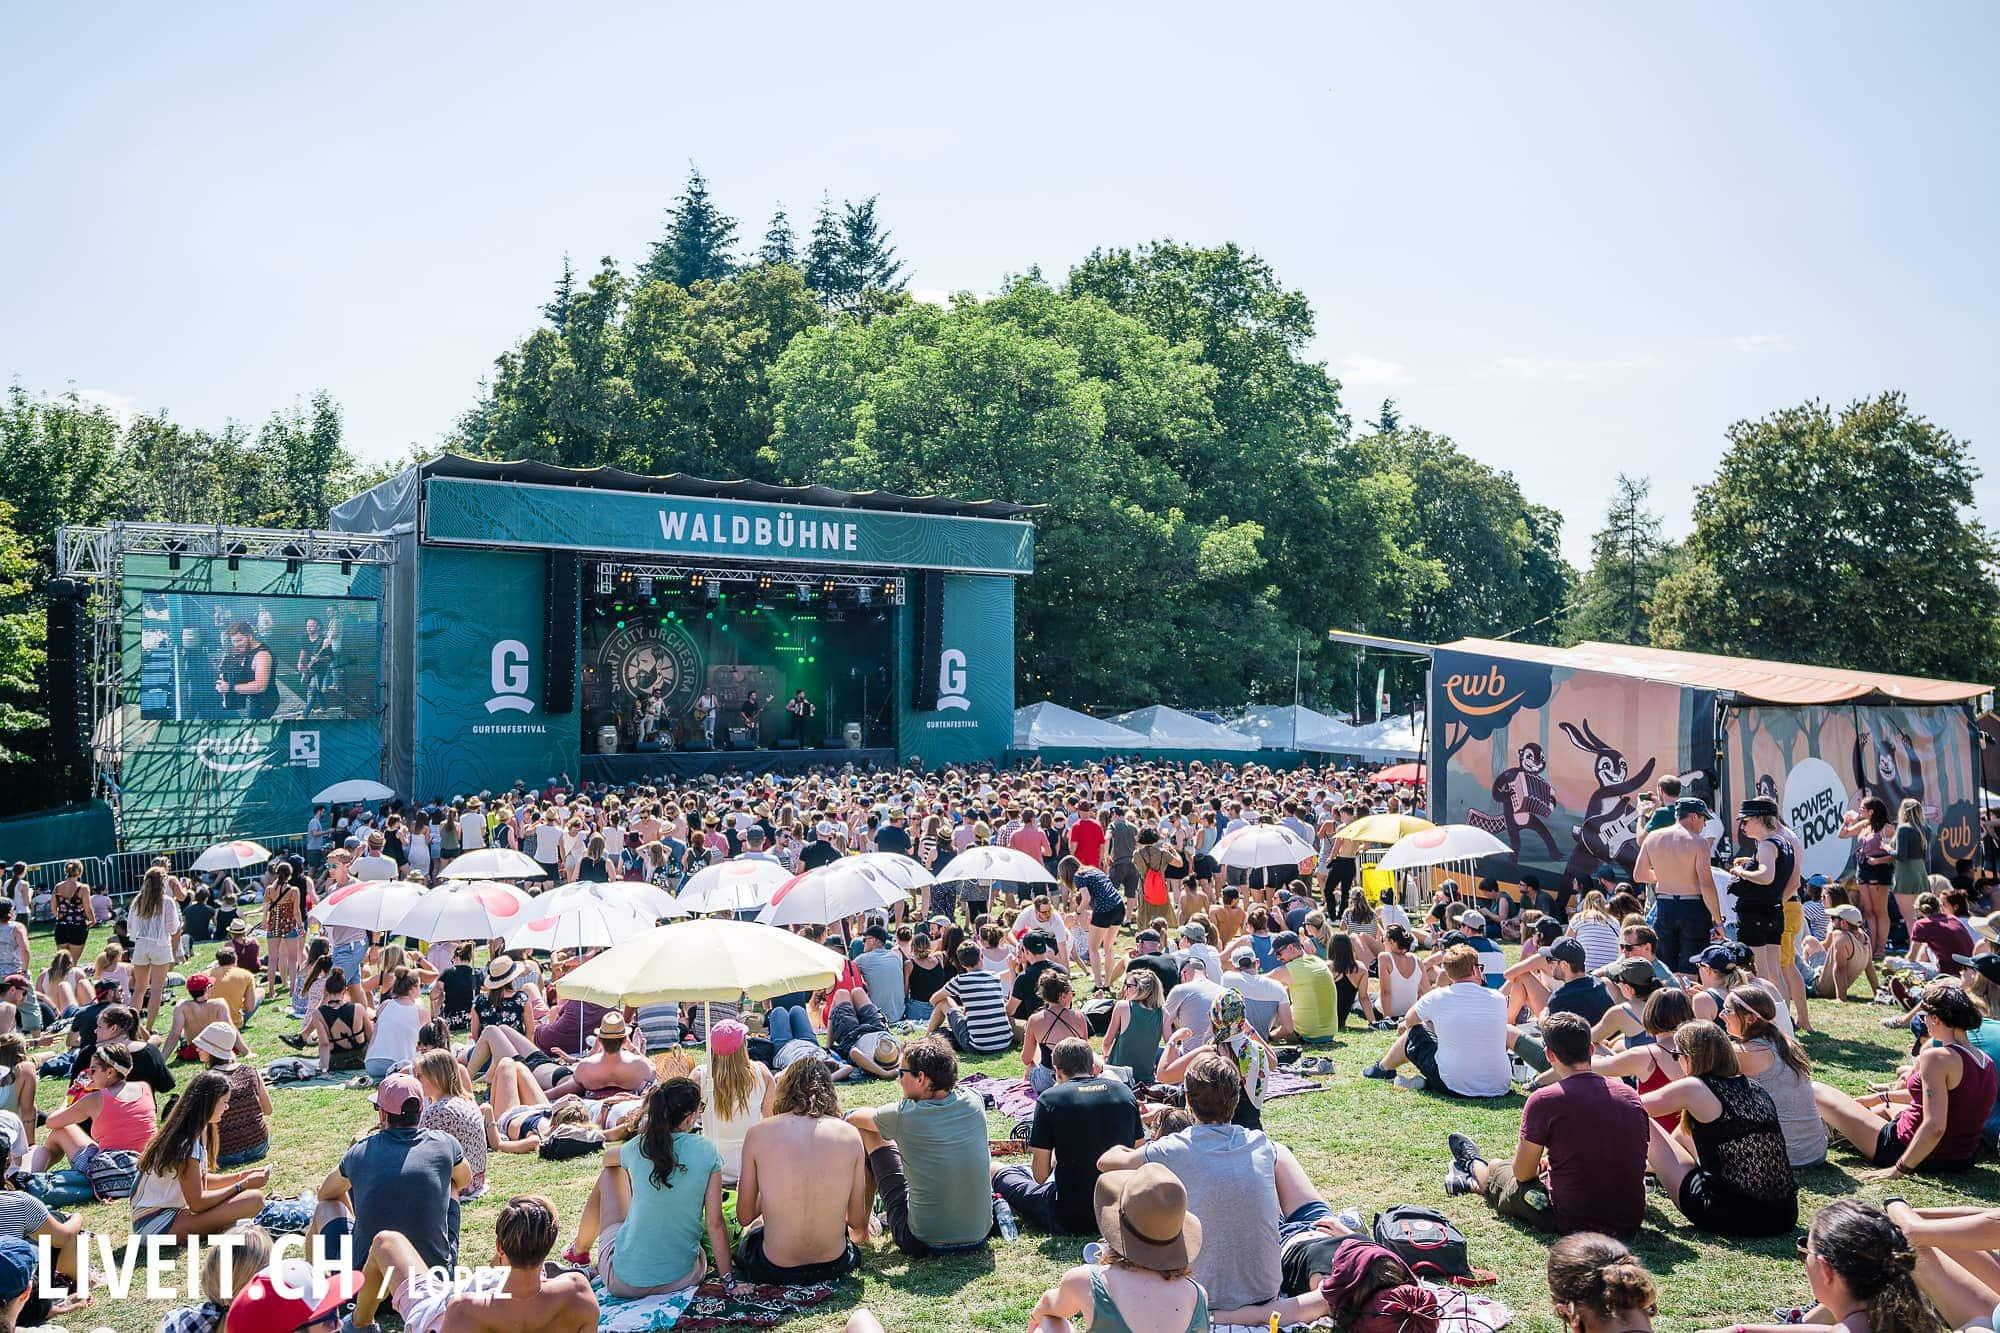 Saint City Orchestra fotografiert am Gurtenfestival 2018 in Bern. (Manuel Lopez for Gurtenfestival)